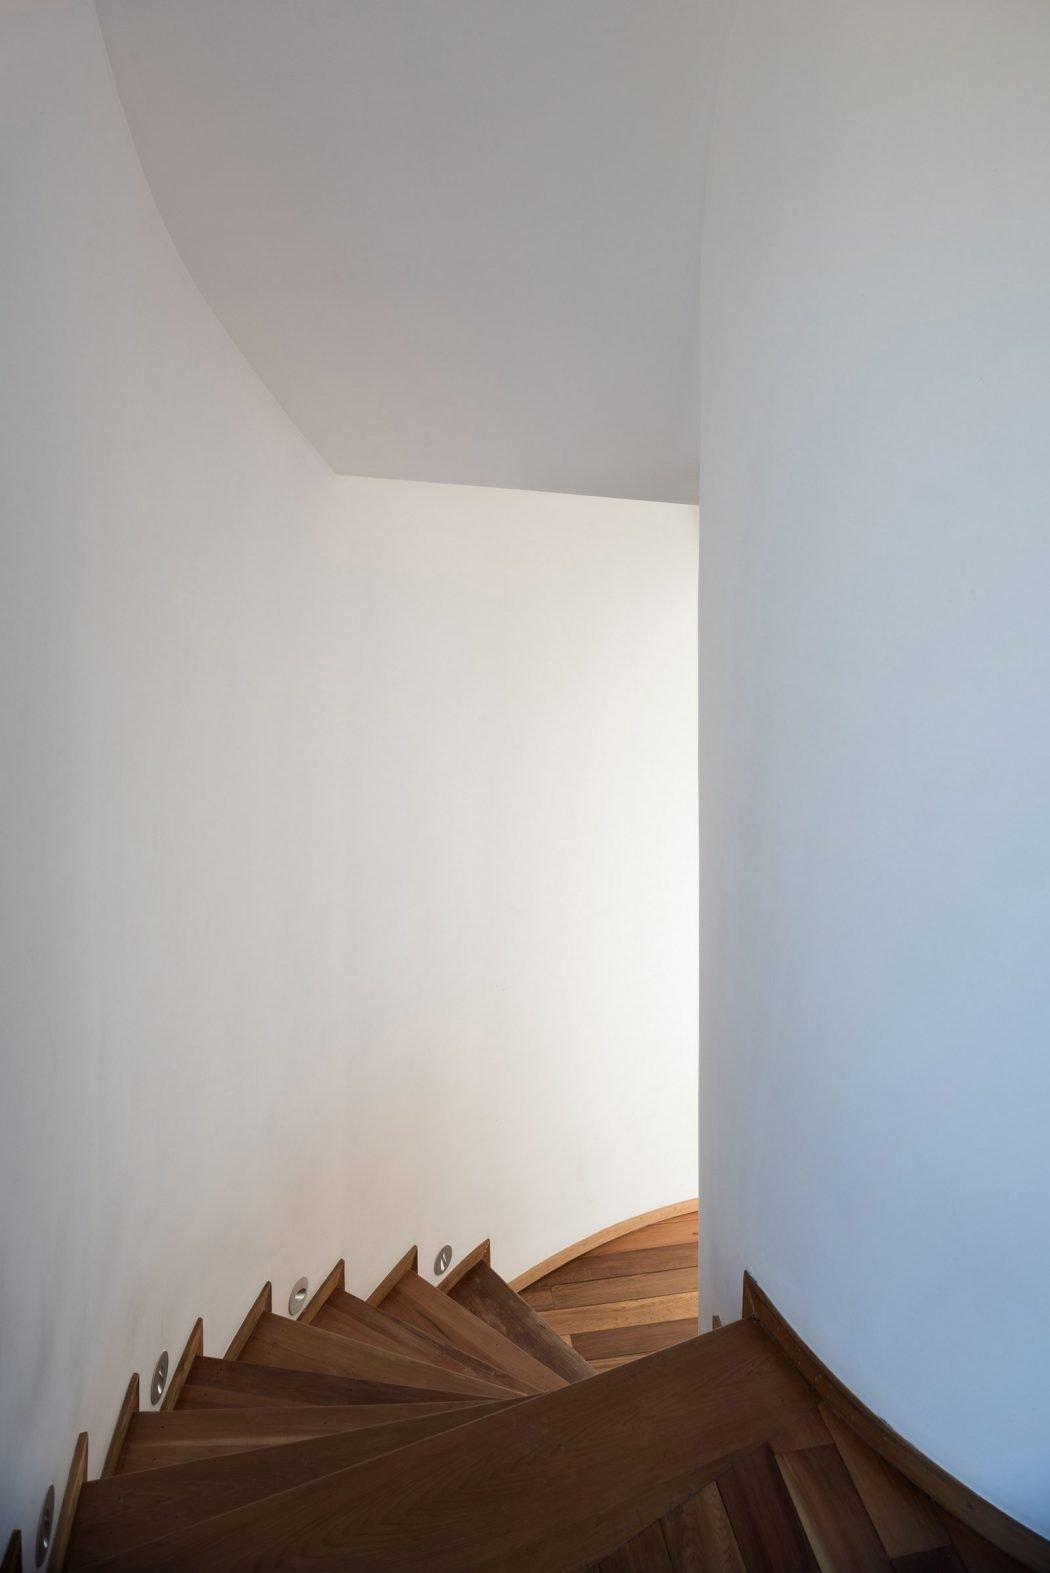 Bengo_Studio_Architecture-7-1050x1573.jpg